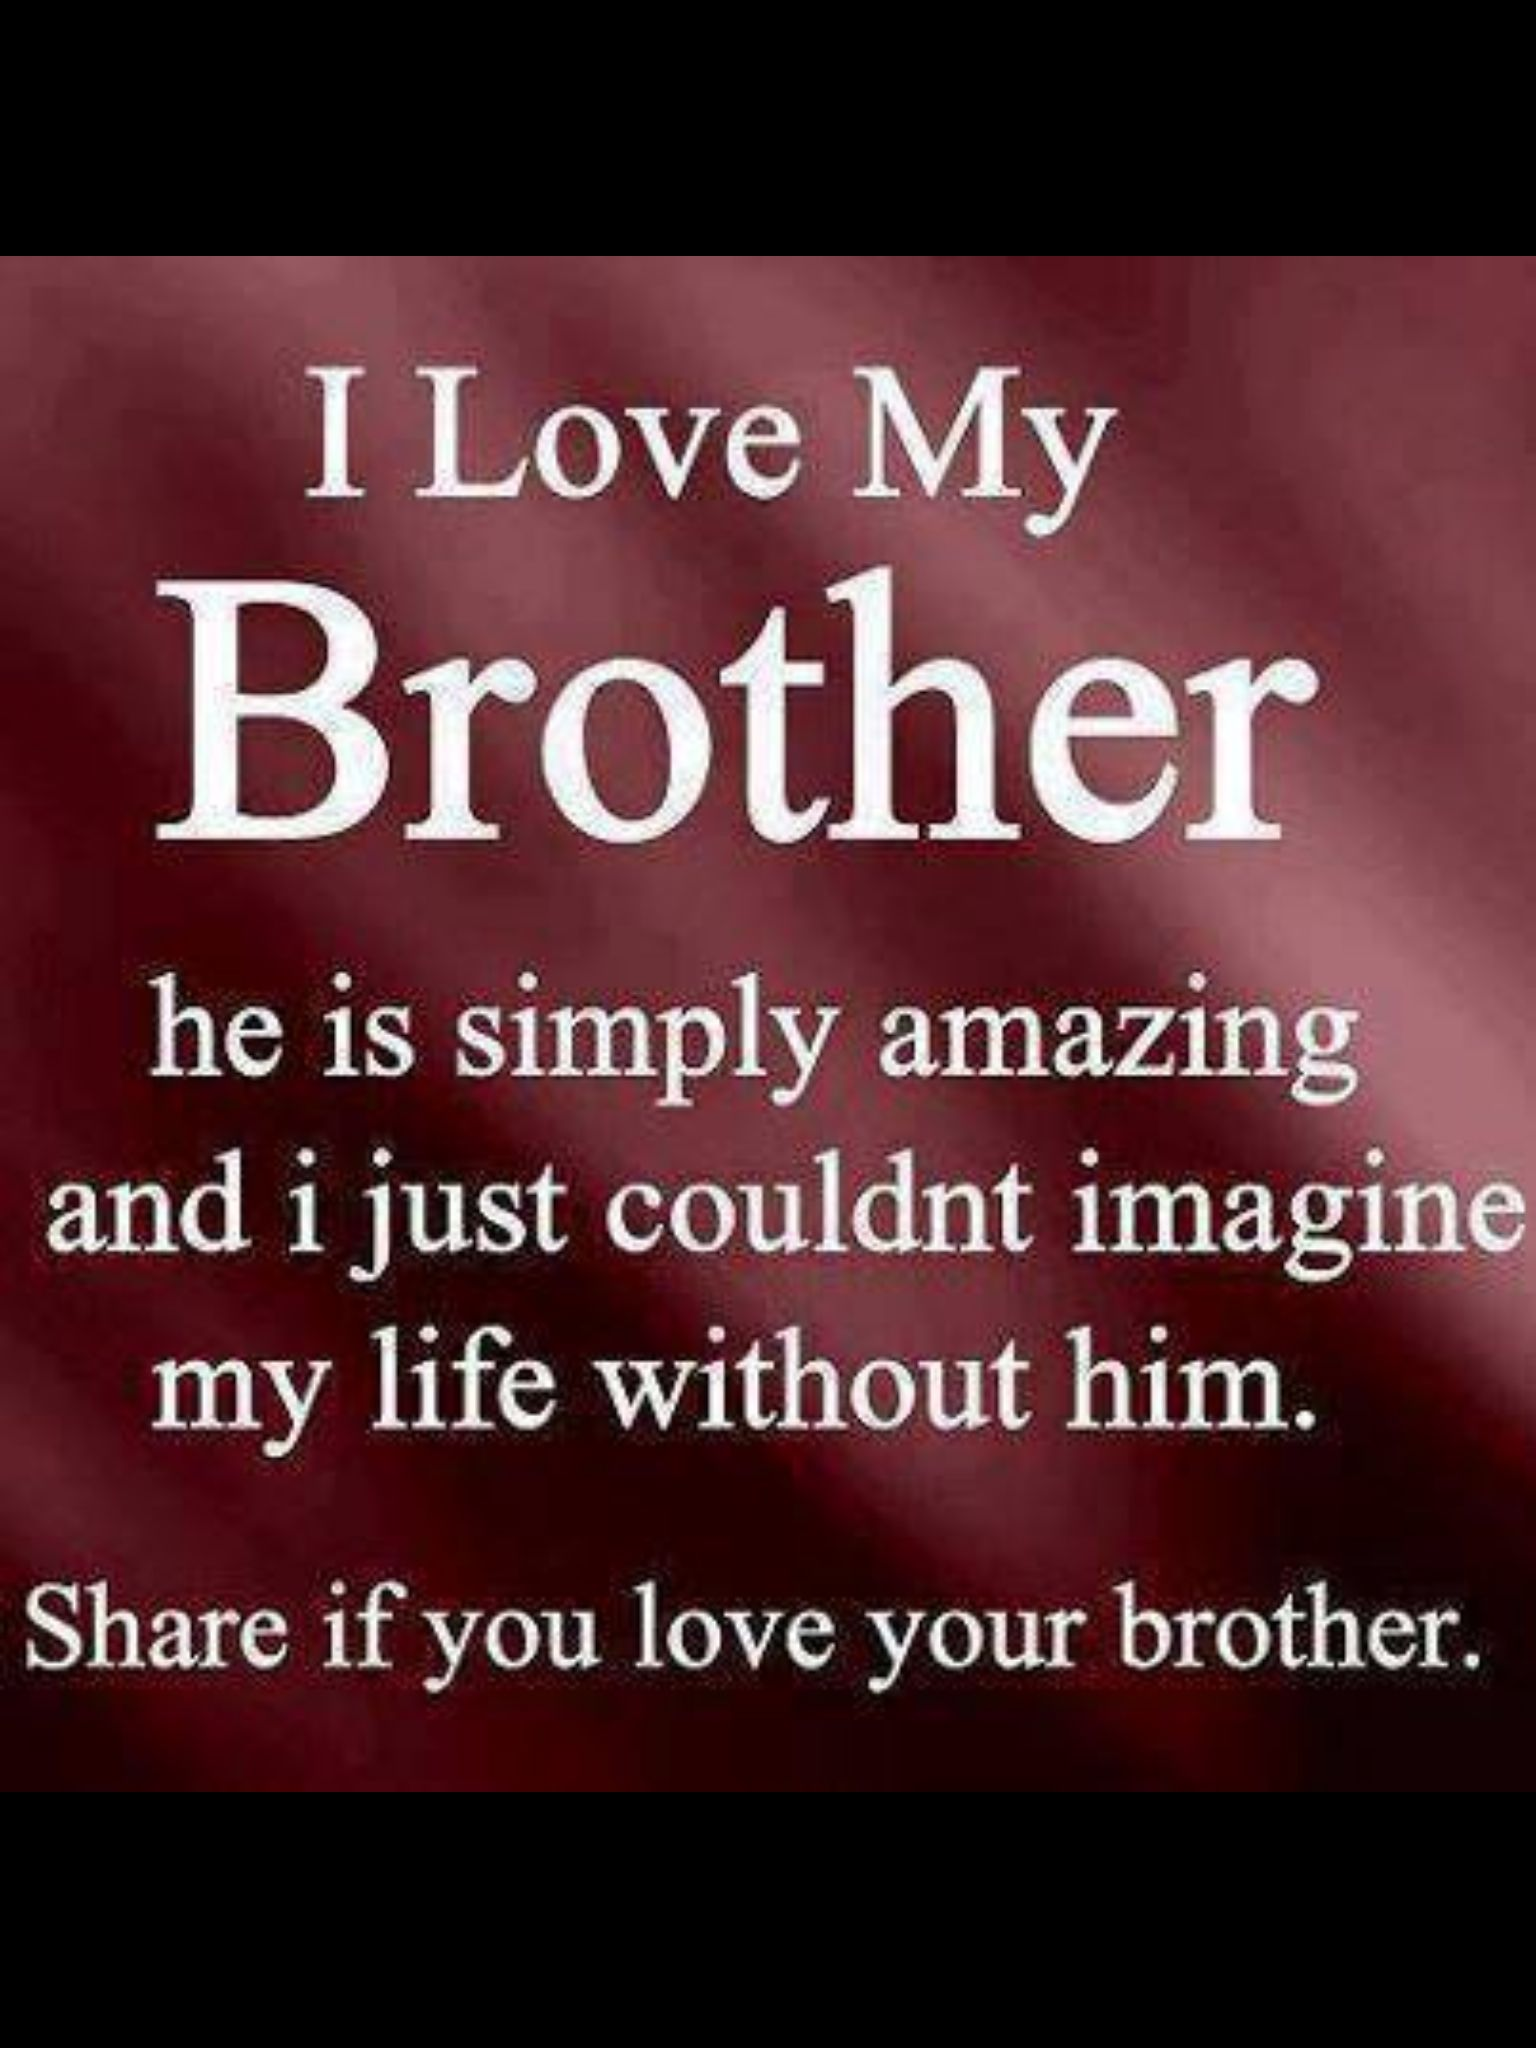 Love You Chuck Families Are Forever Pinterest Bruder Bruder